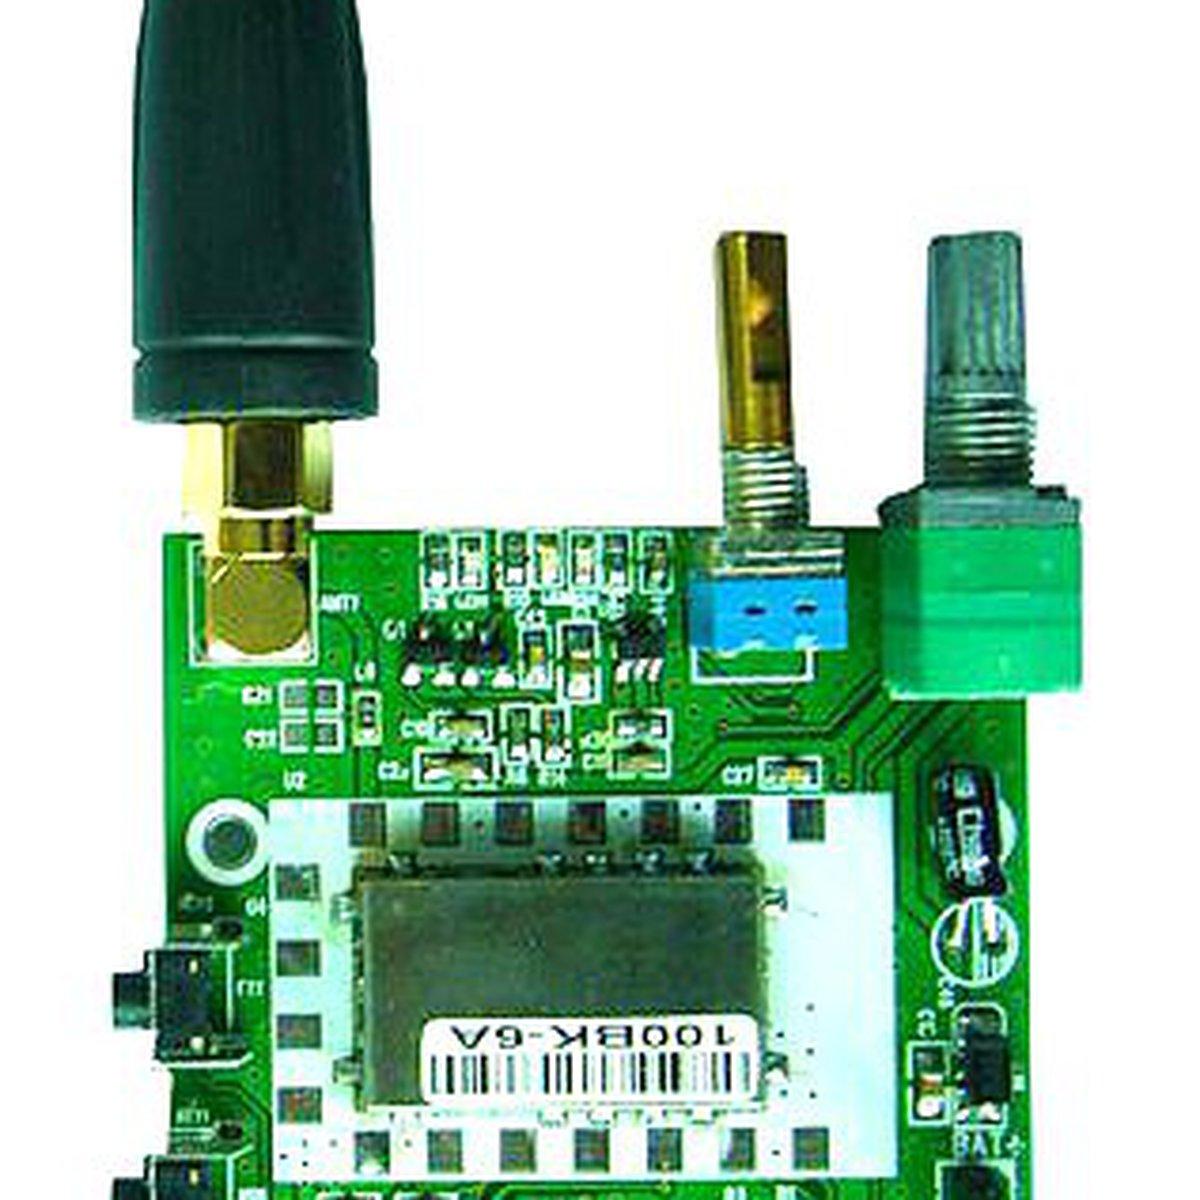 FRS_DEMO_B demo board (for 0 5W UHF module)